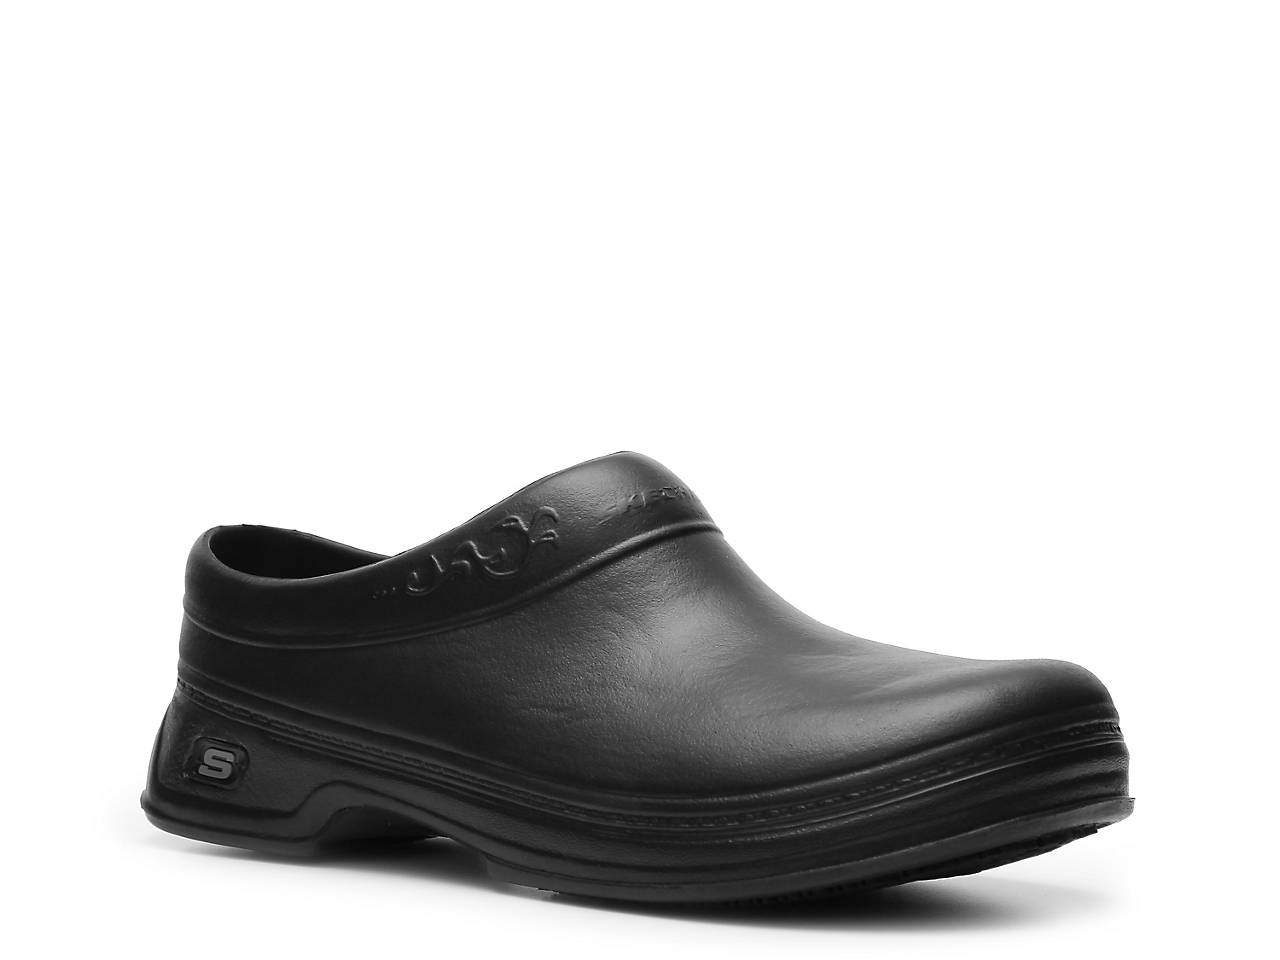 d0cef0f1594 Skechers Work Clara Clog Women s Shoes